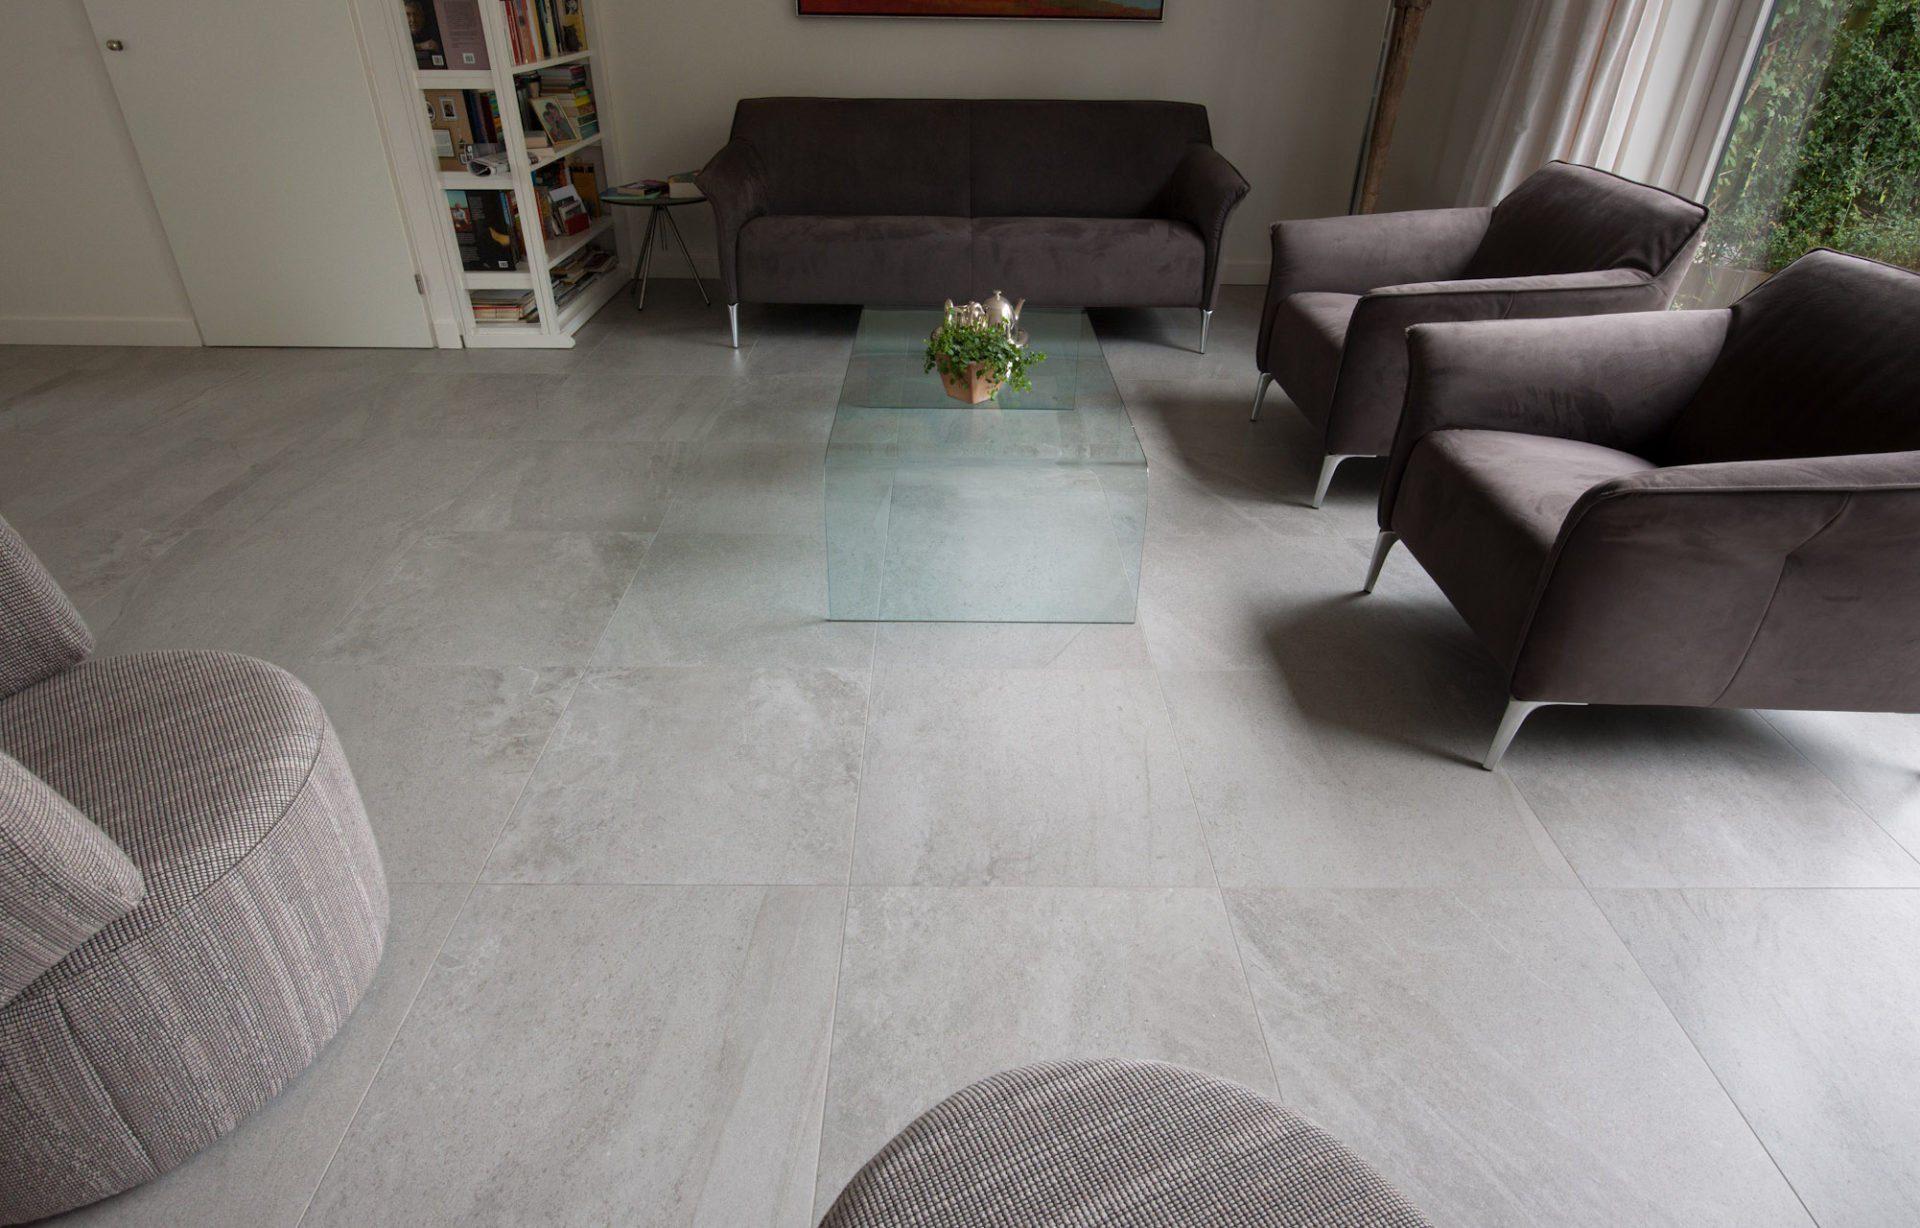 Grijze Tegels Woonkamer : Lounge grijze tegels vloertegels woonkamer kroon vloeren in steen